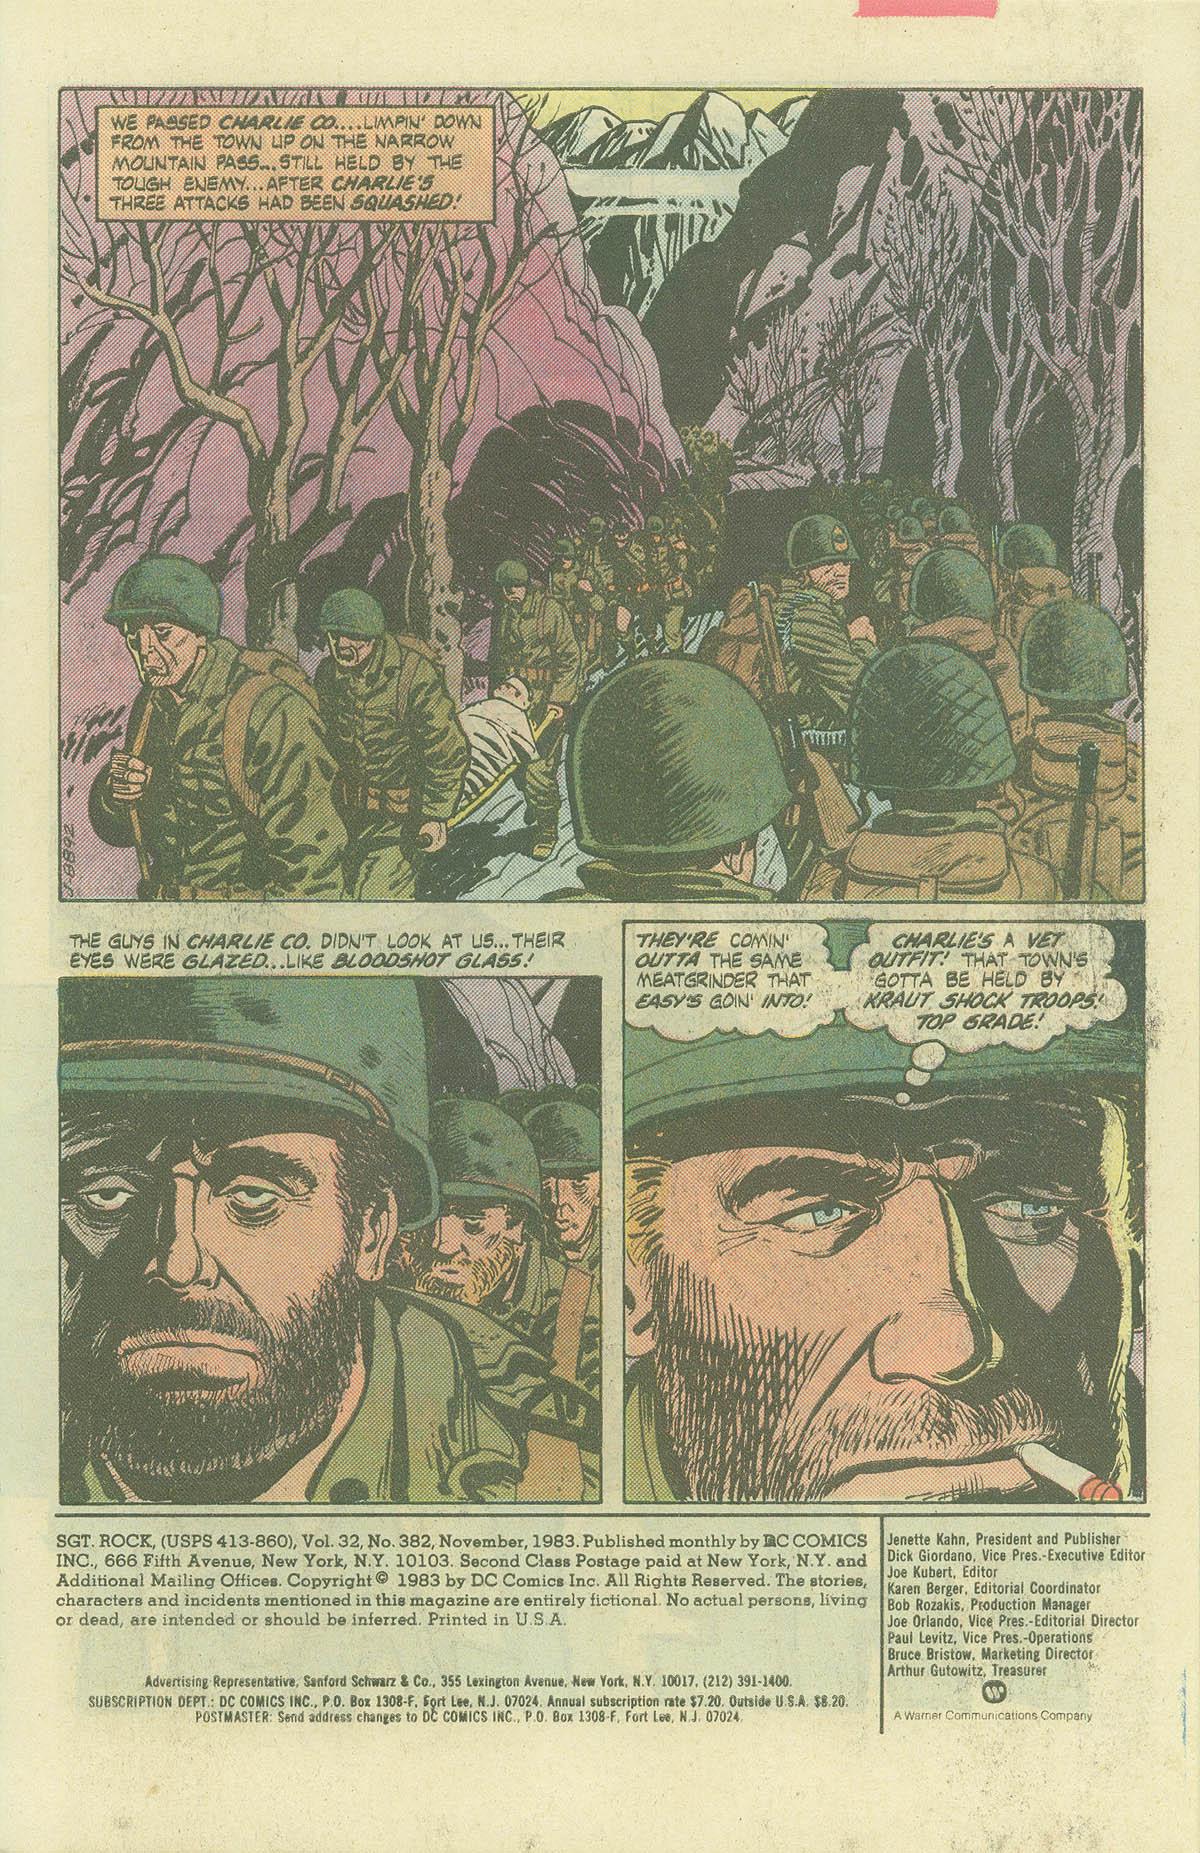 Read online Sgt. Rock comic -  Issue #382 - 3